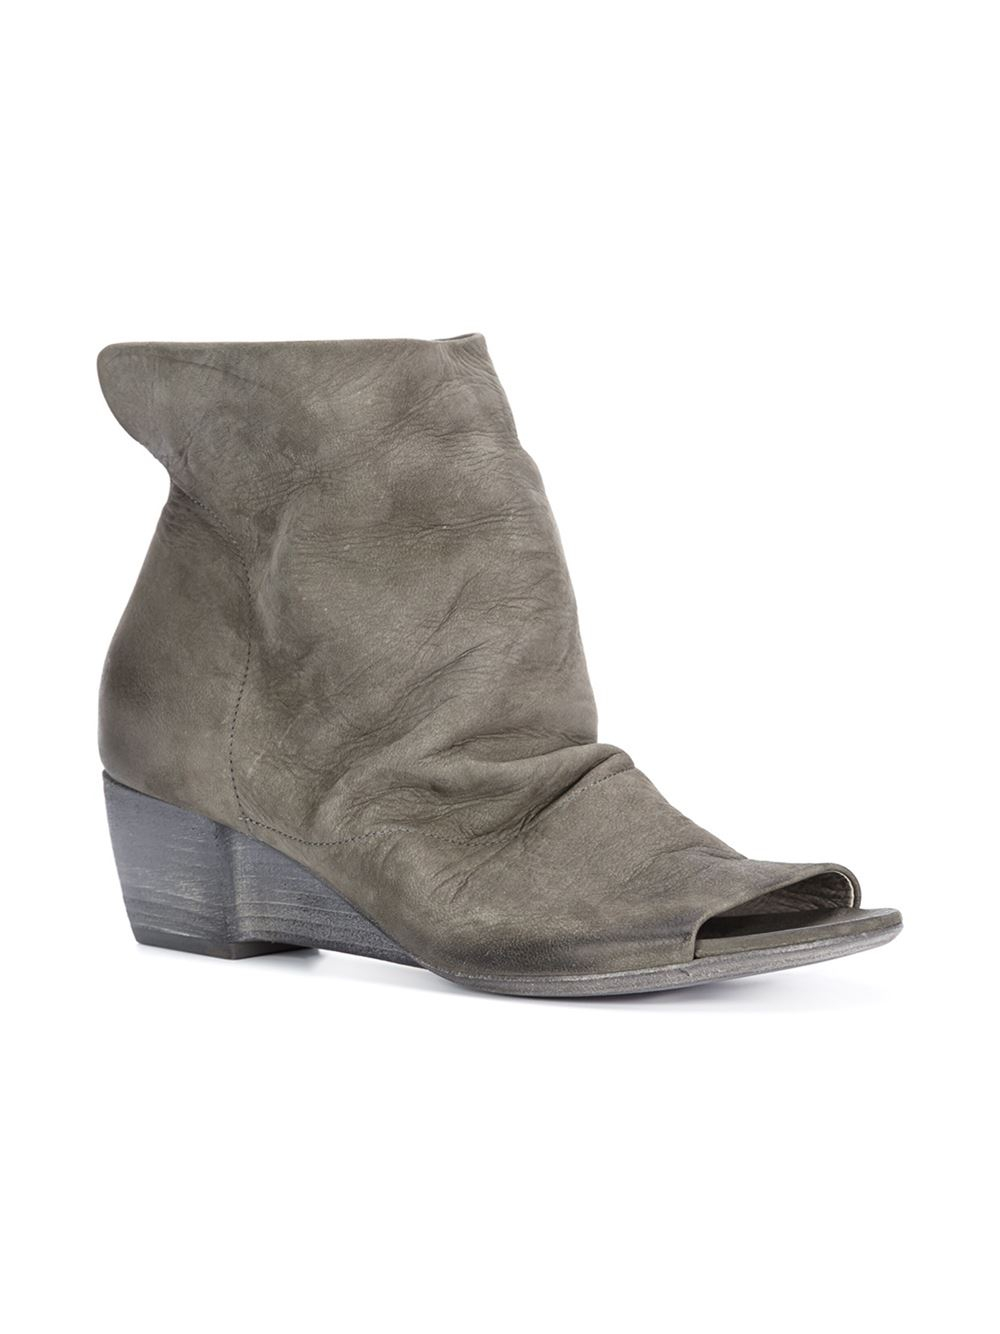 Marsèll Leather Peep-Toe Booties discount 100% original buy cheap finishline t3nOi